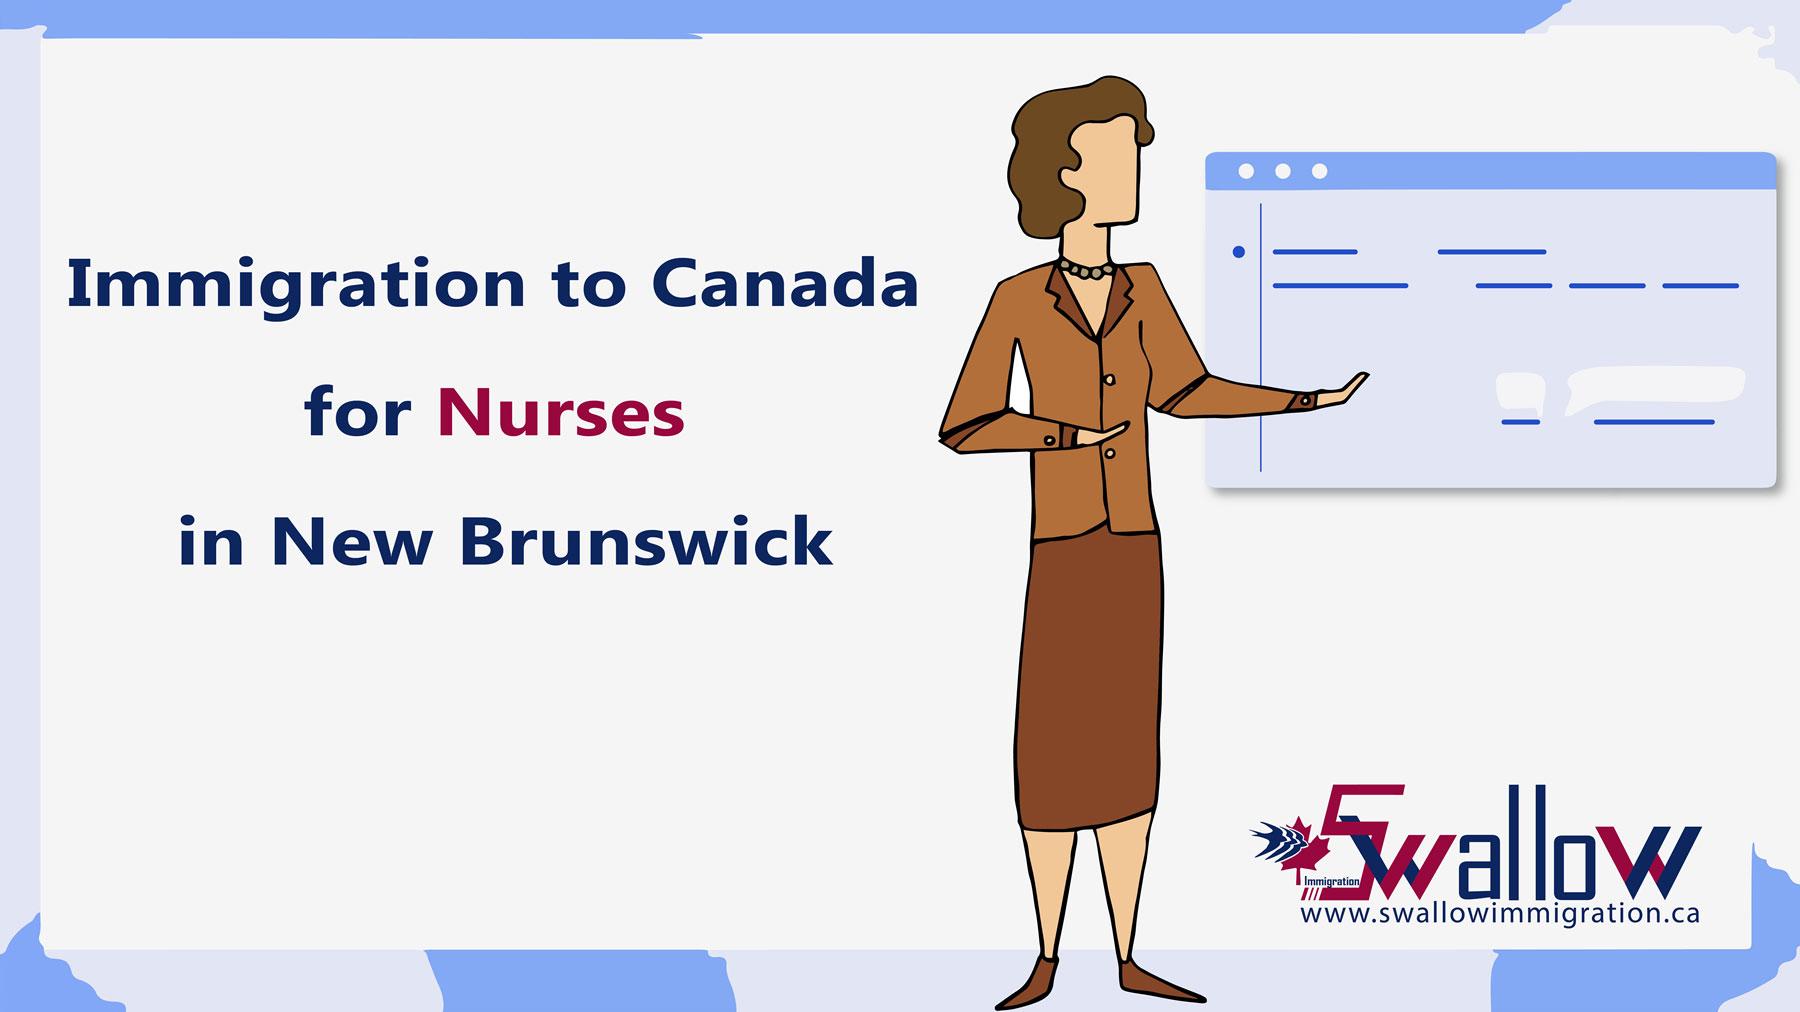 Migration for Nurses